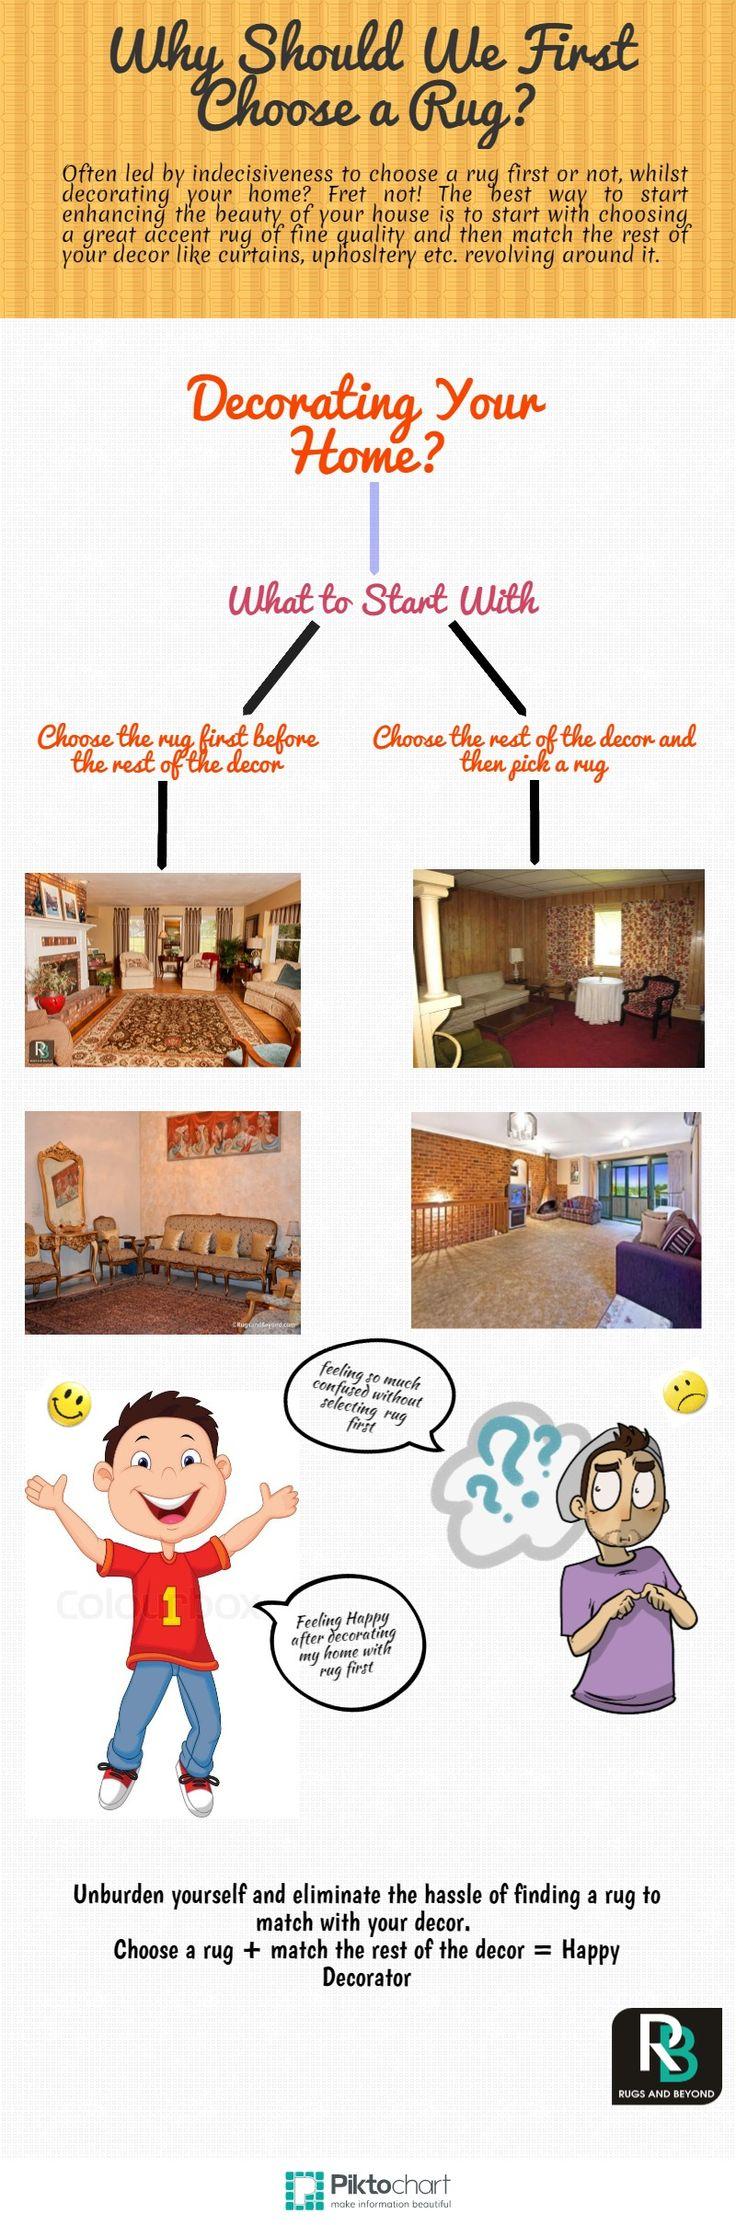 "Top Tips  ""Why should We First Choose a Rug First""  here #Homeshopping #interiordesign #handmaderugs #rugsandbeyond #homedecor #love #true #freeshipping #homedesign"